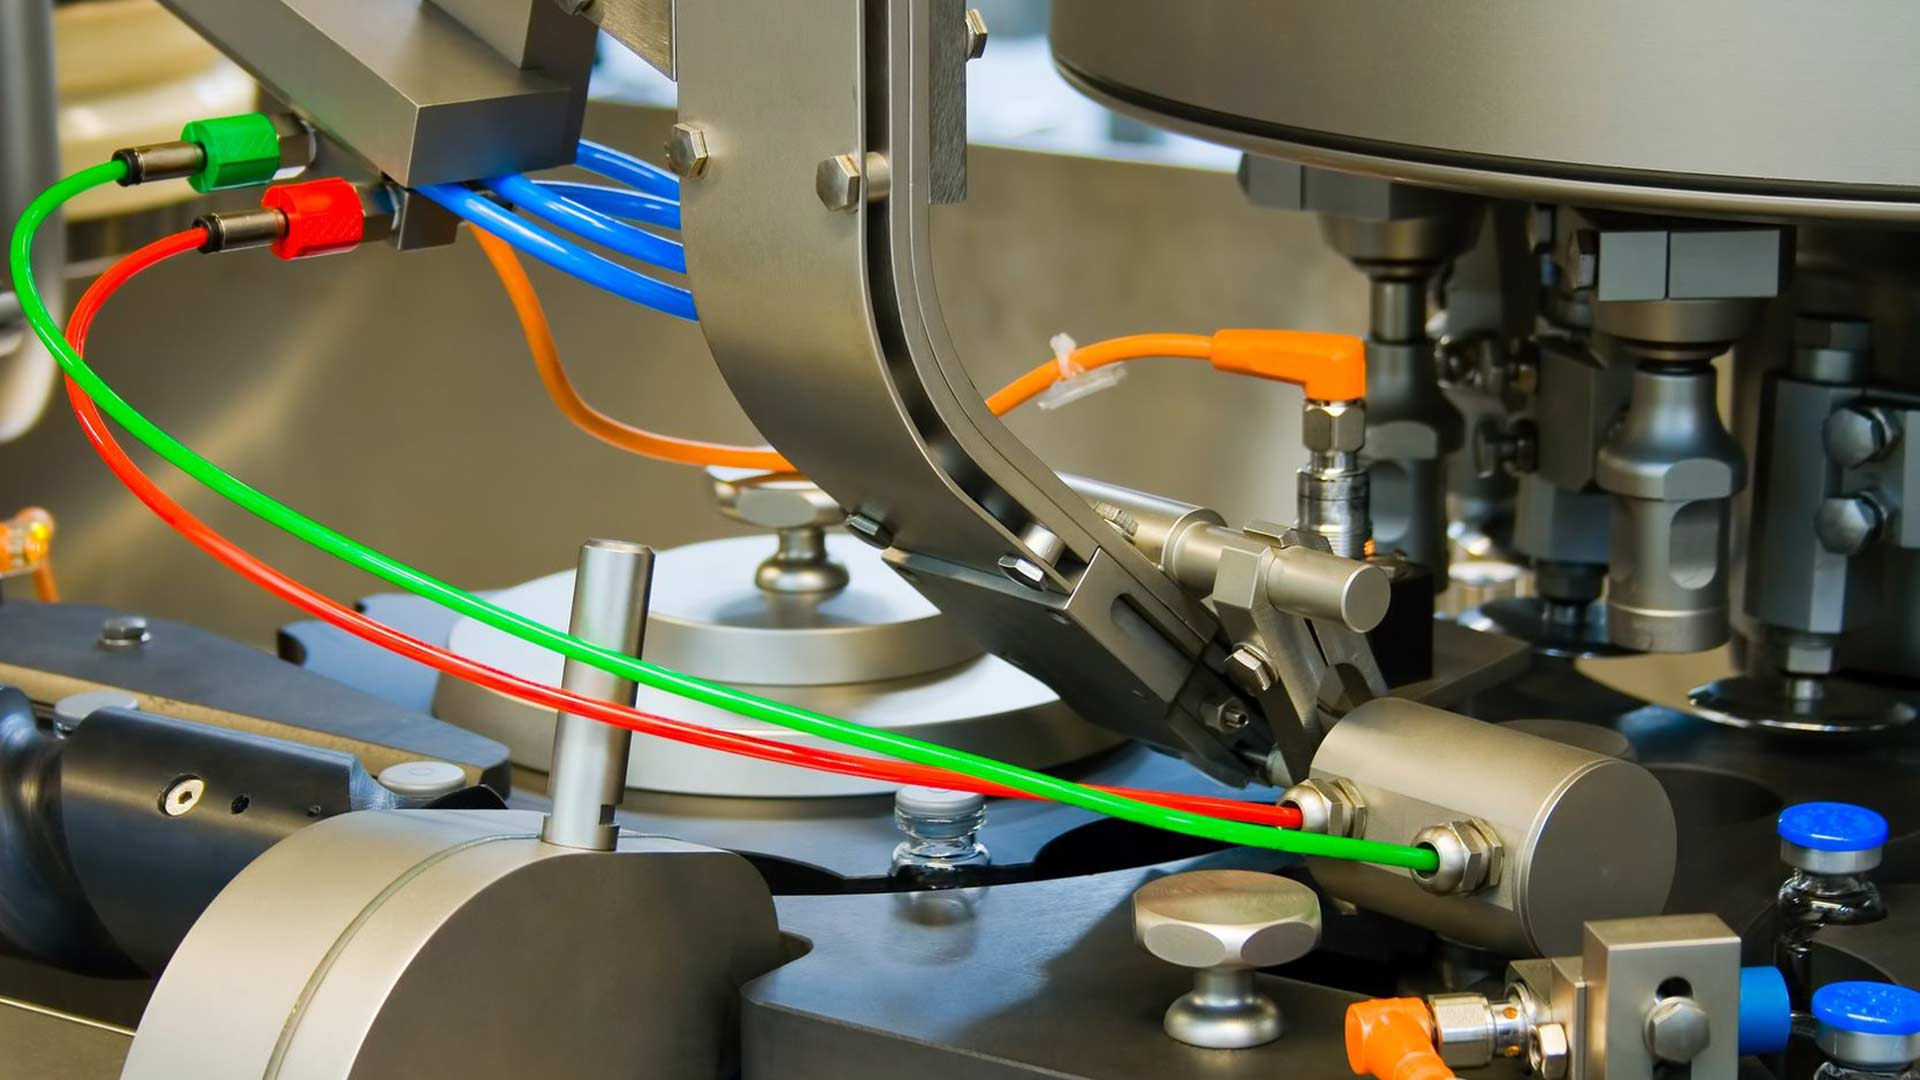 fabrication équipement industriel